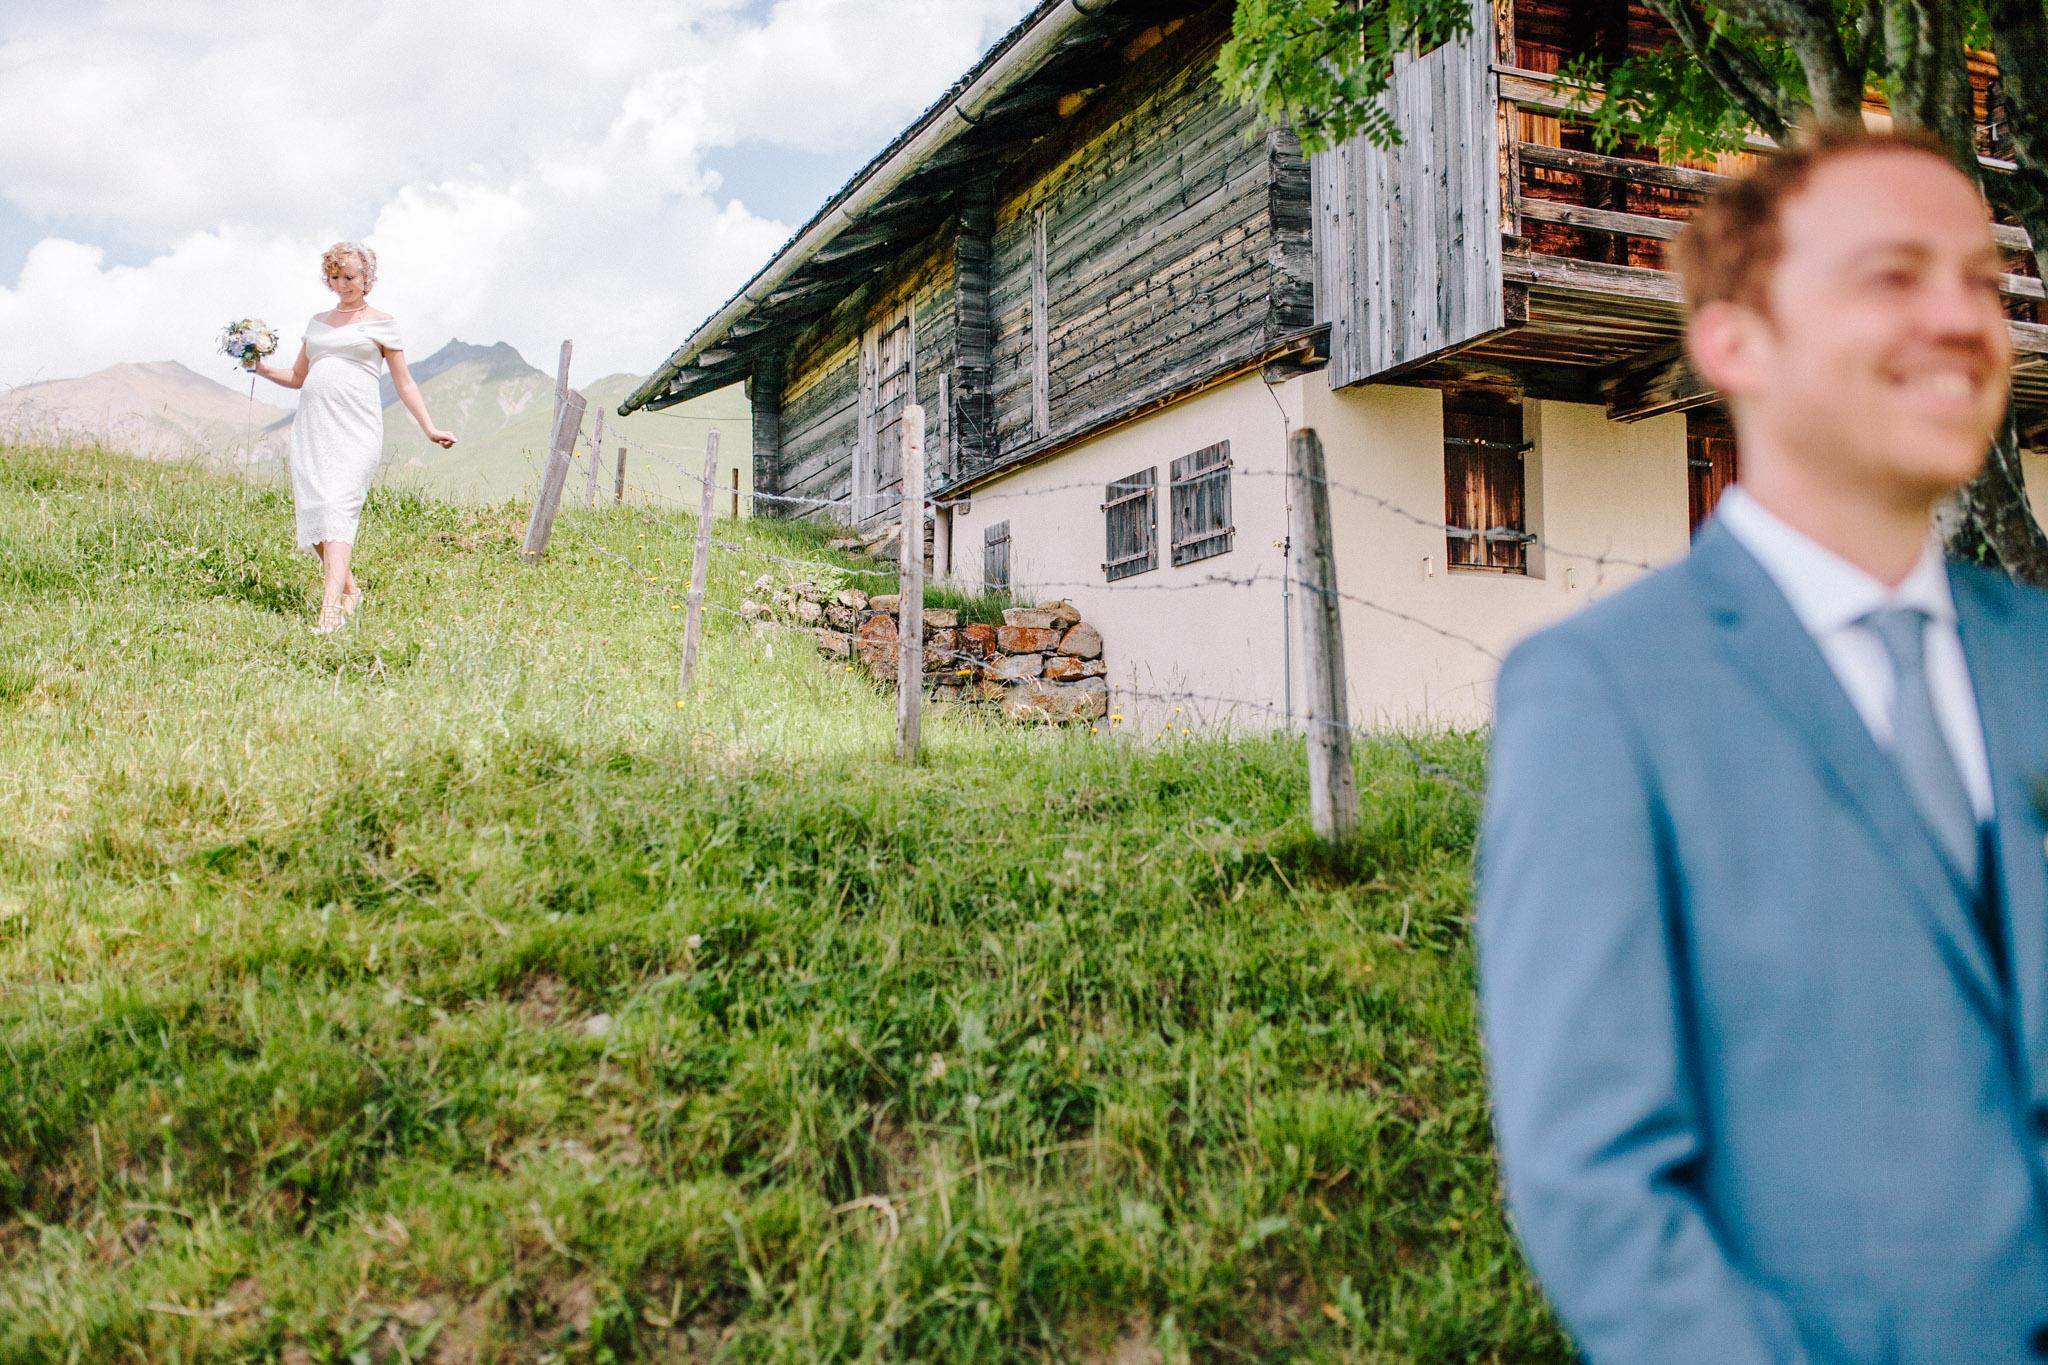 Lenl-Simmental-Buehlerhof-Pia-Anna-Christian-Wedding-Photography-EK-34.jpg